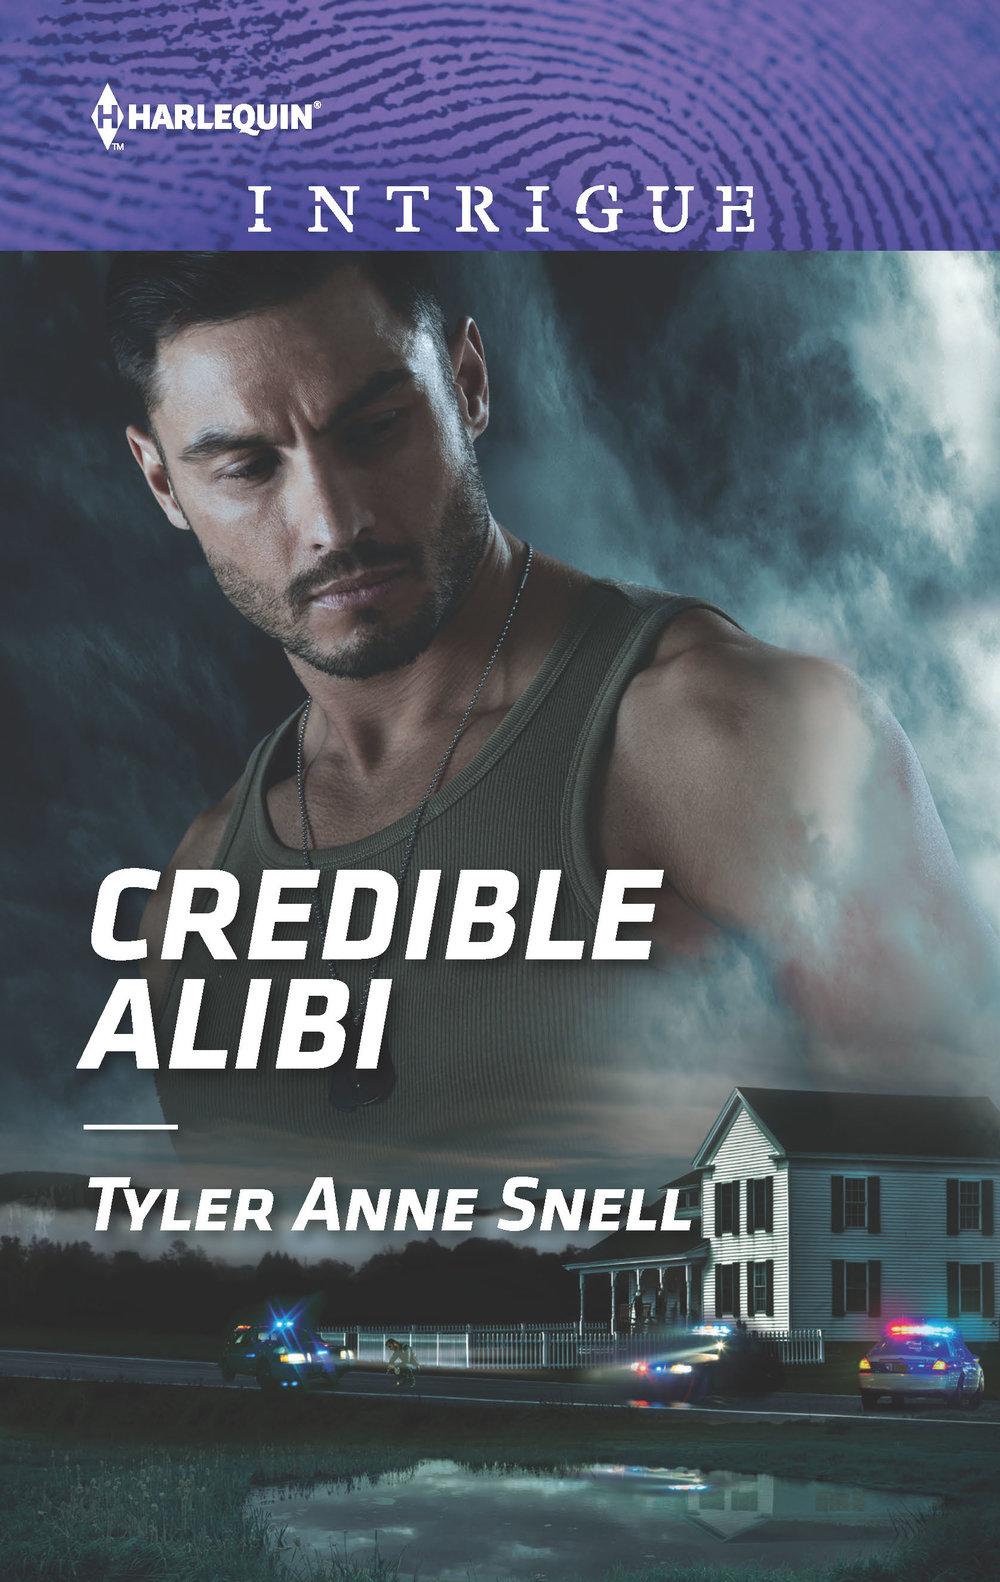 Credible Alibi